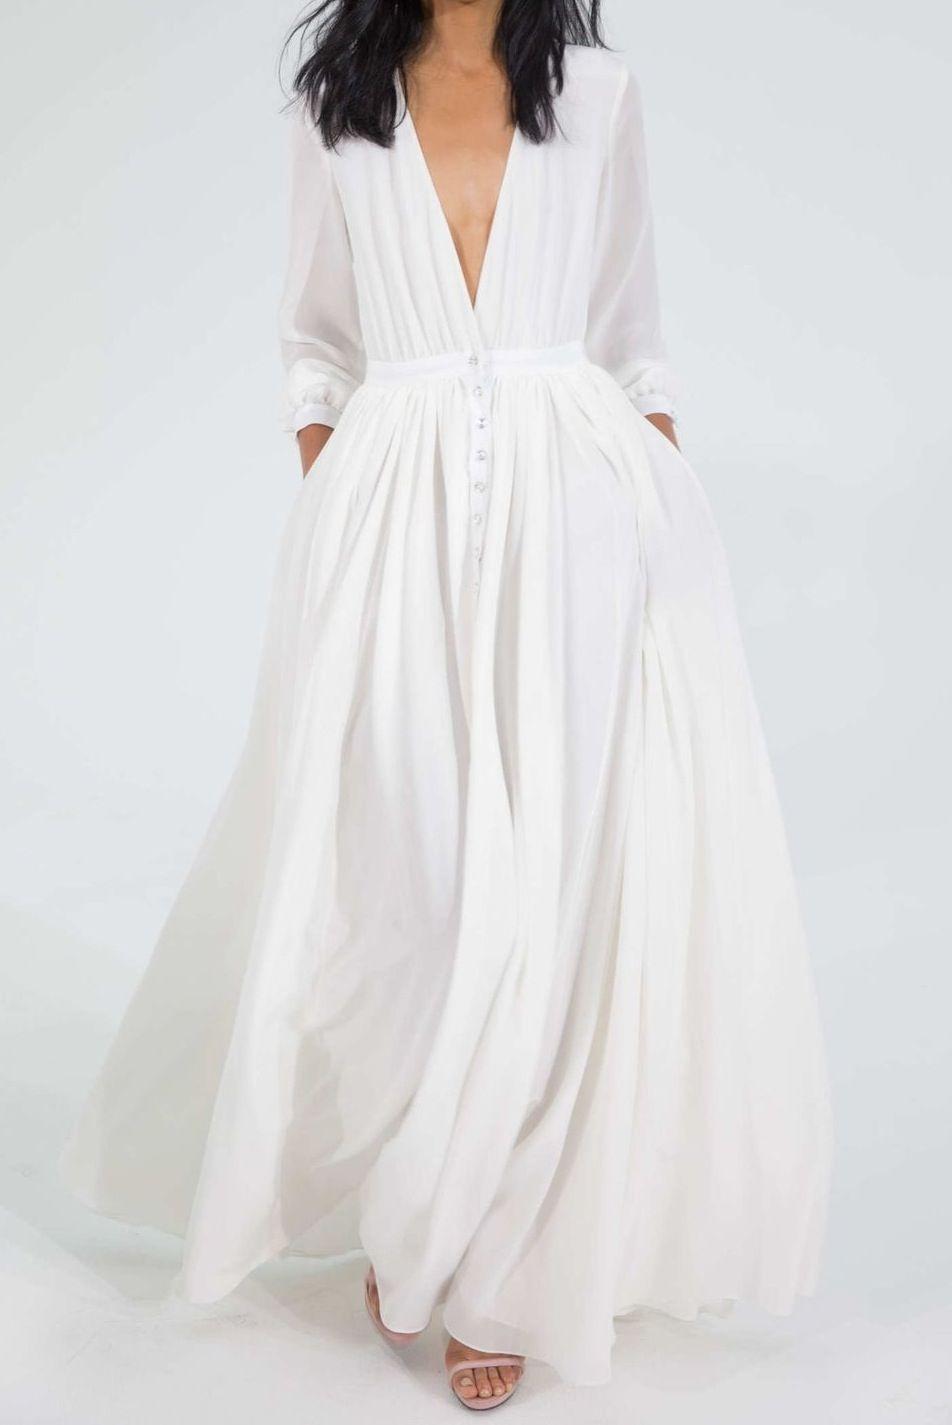 b1eccd242c00 white dress | style | Fashion, White maxi dresses, Dresses